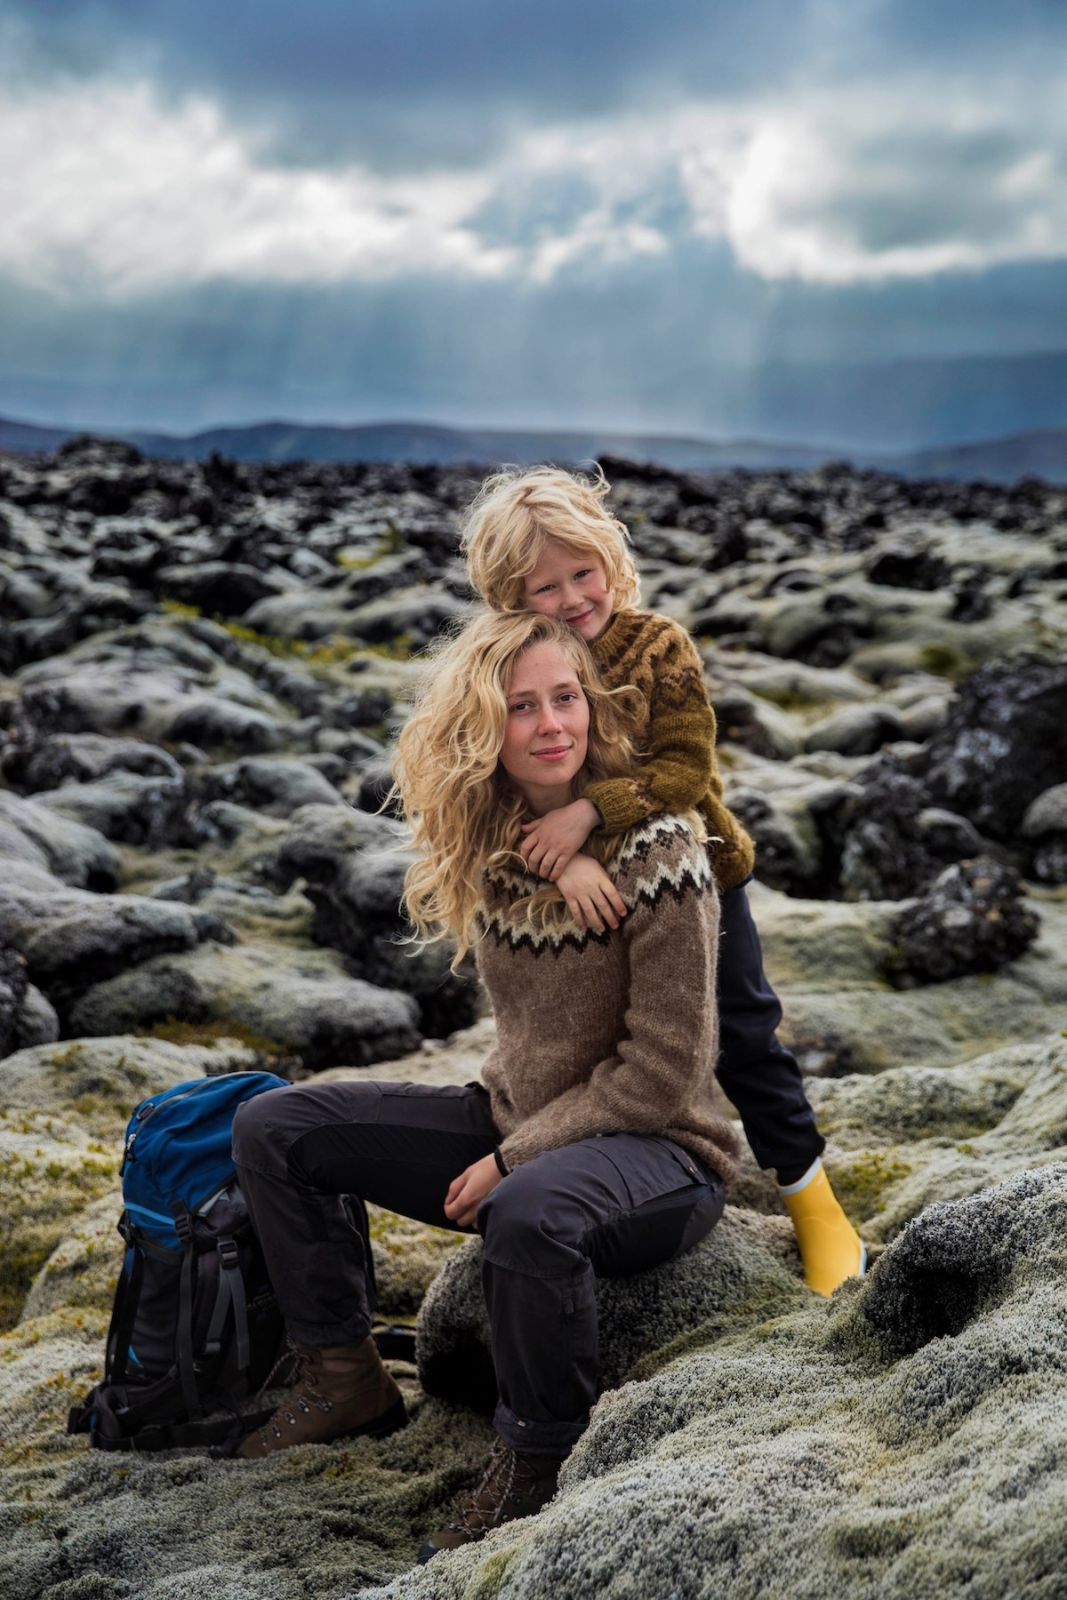 beautiful motherhood bonding photos mihaela noroc